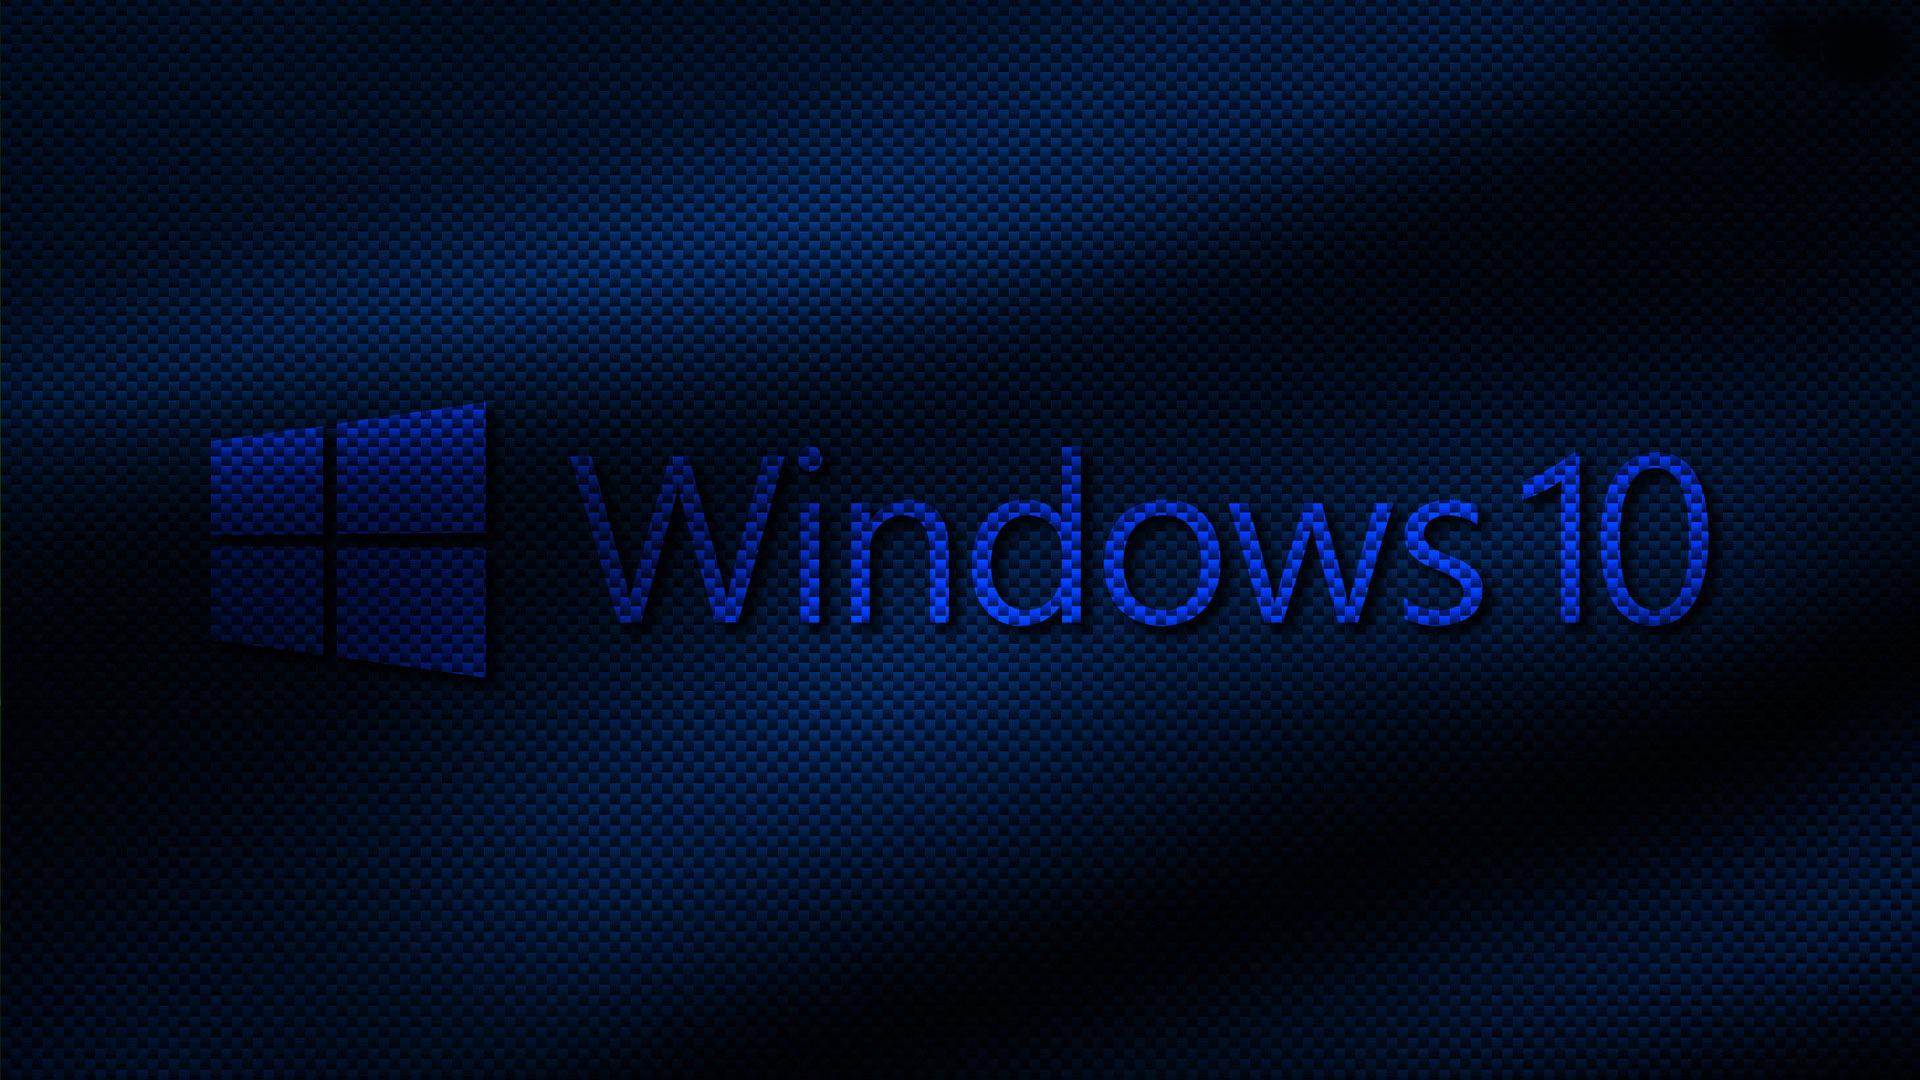 50 Best Wallpapers For Windows 10  addictivetipscom